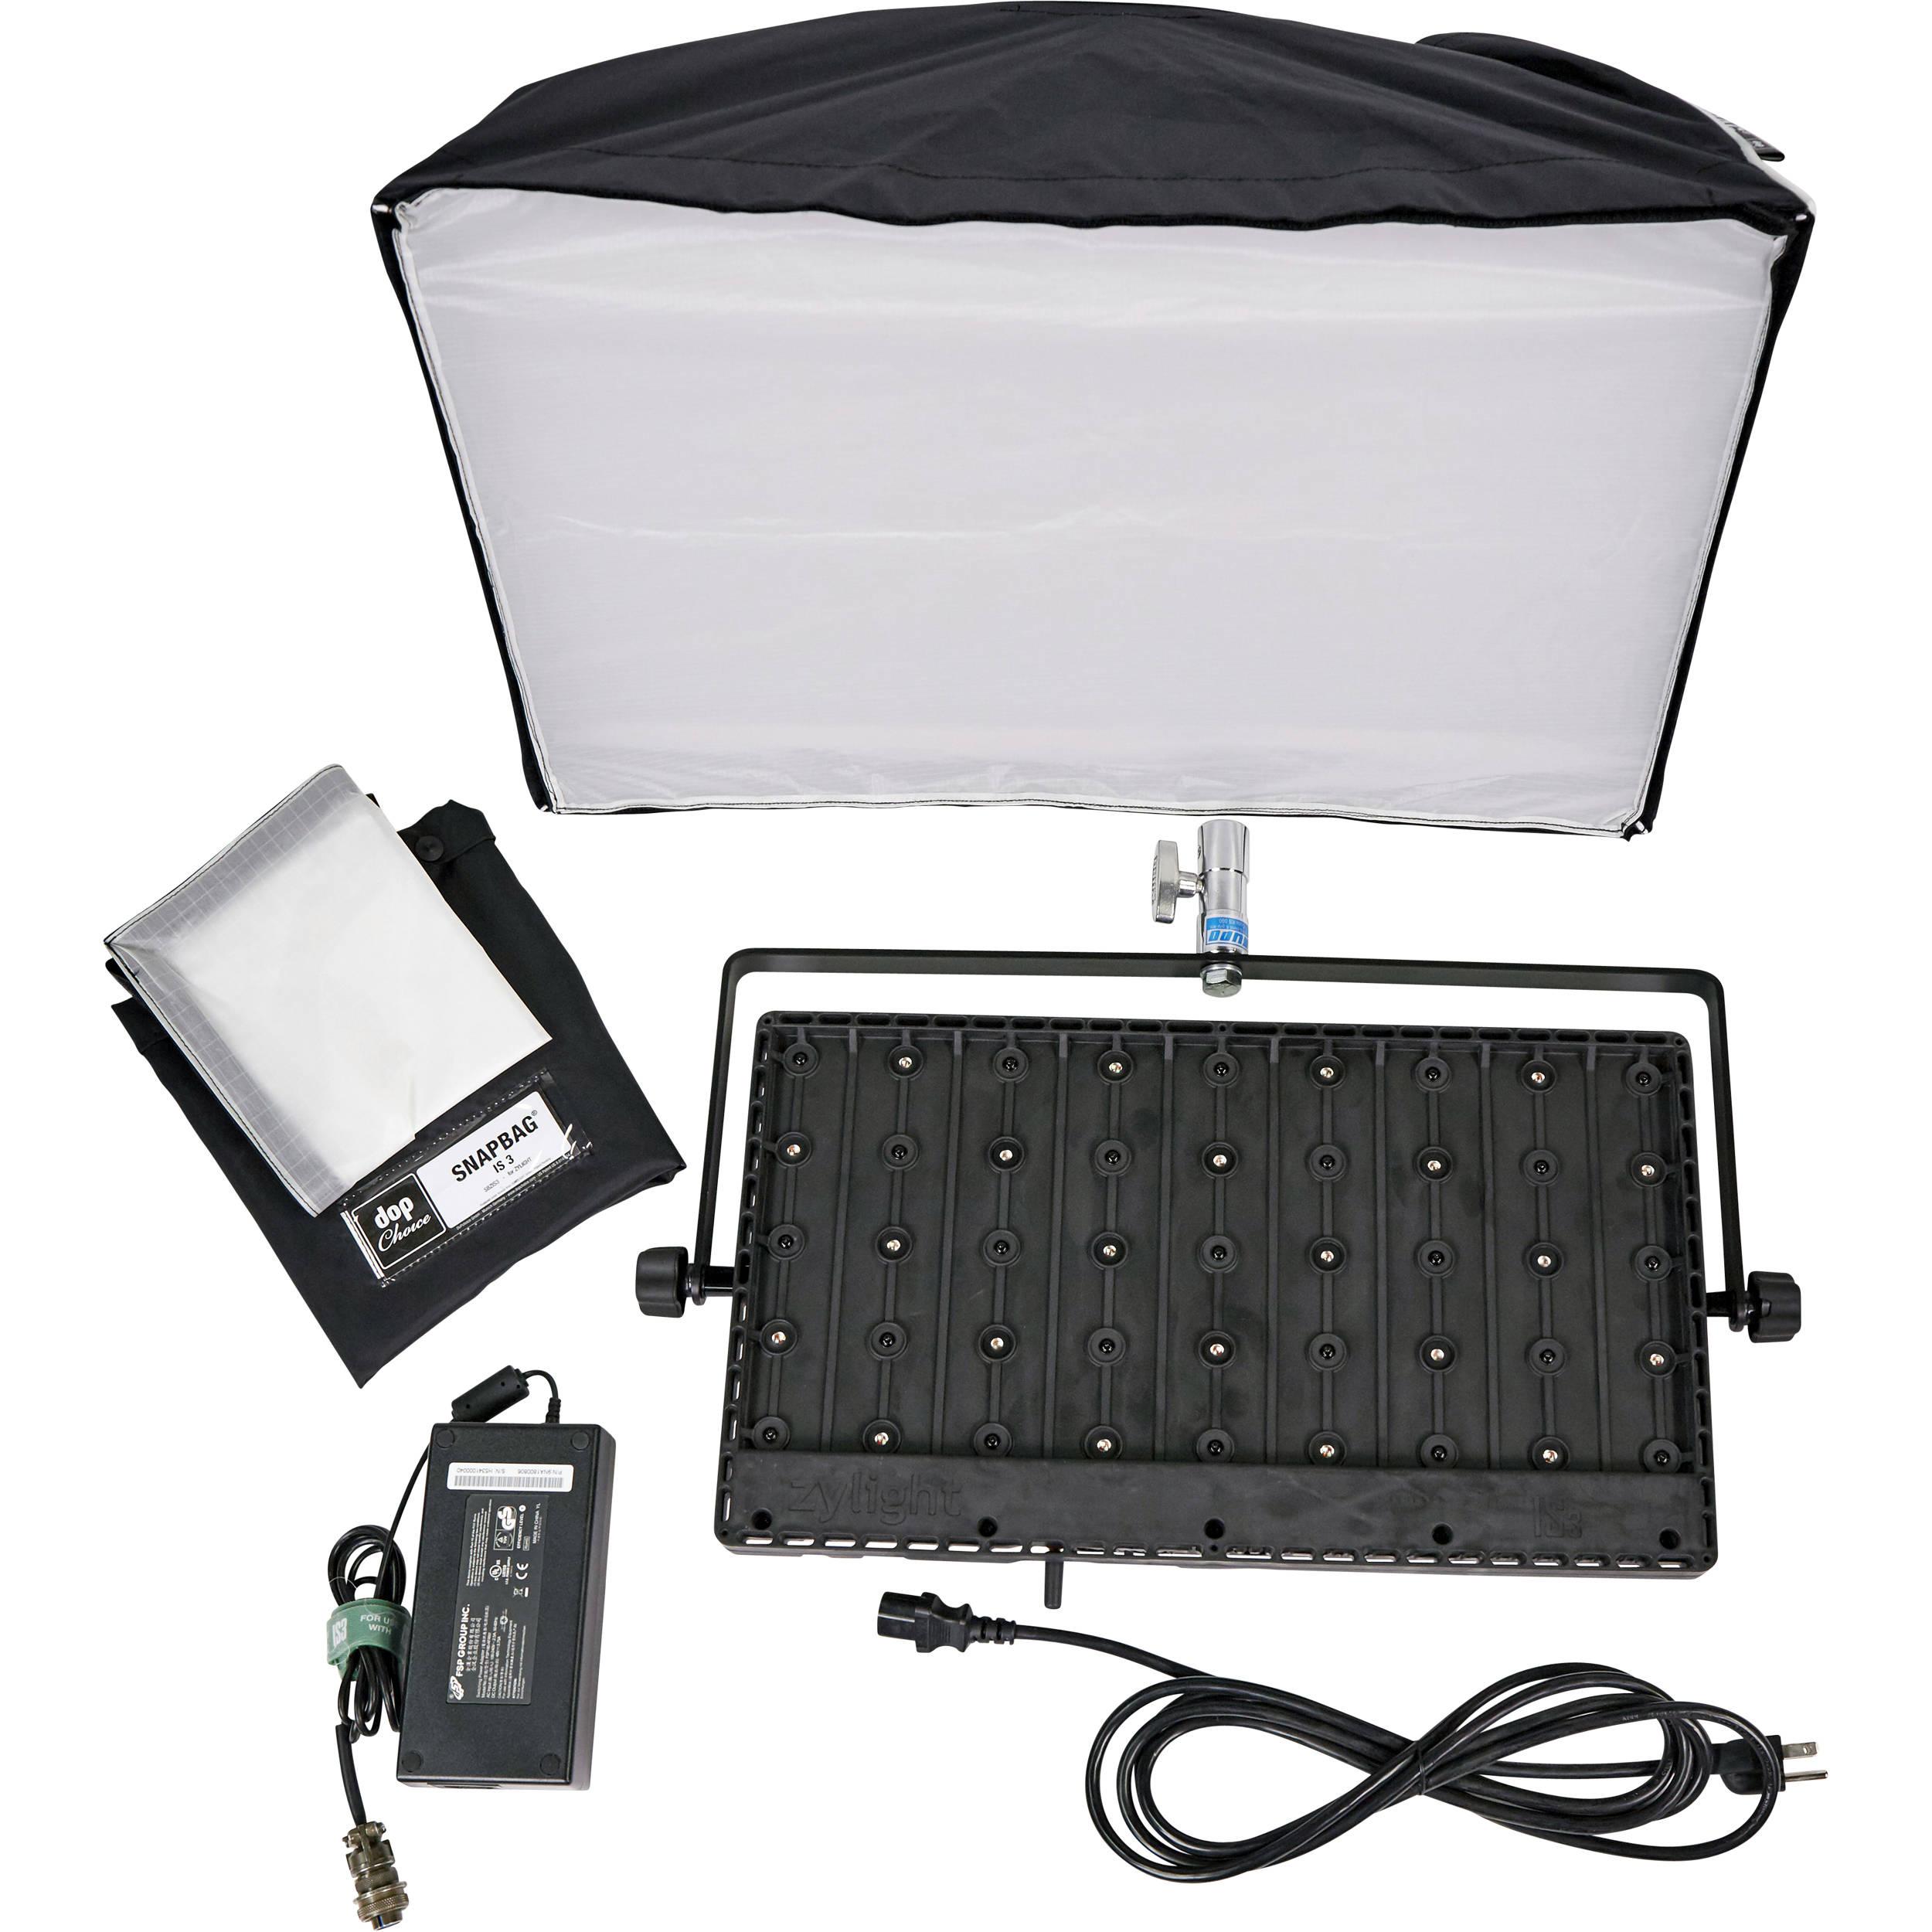 Zylight Is3d Led Light Kit 26 01032 B Amp H Photo Video